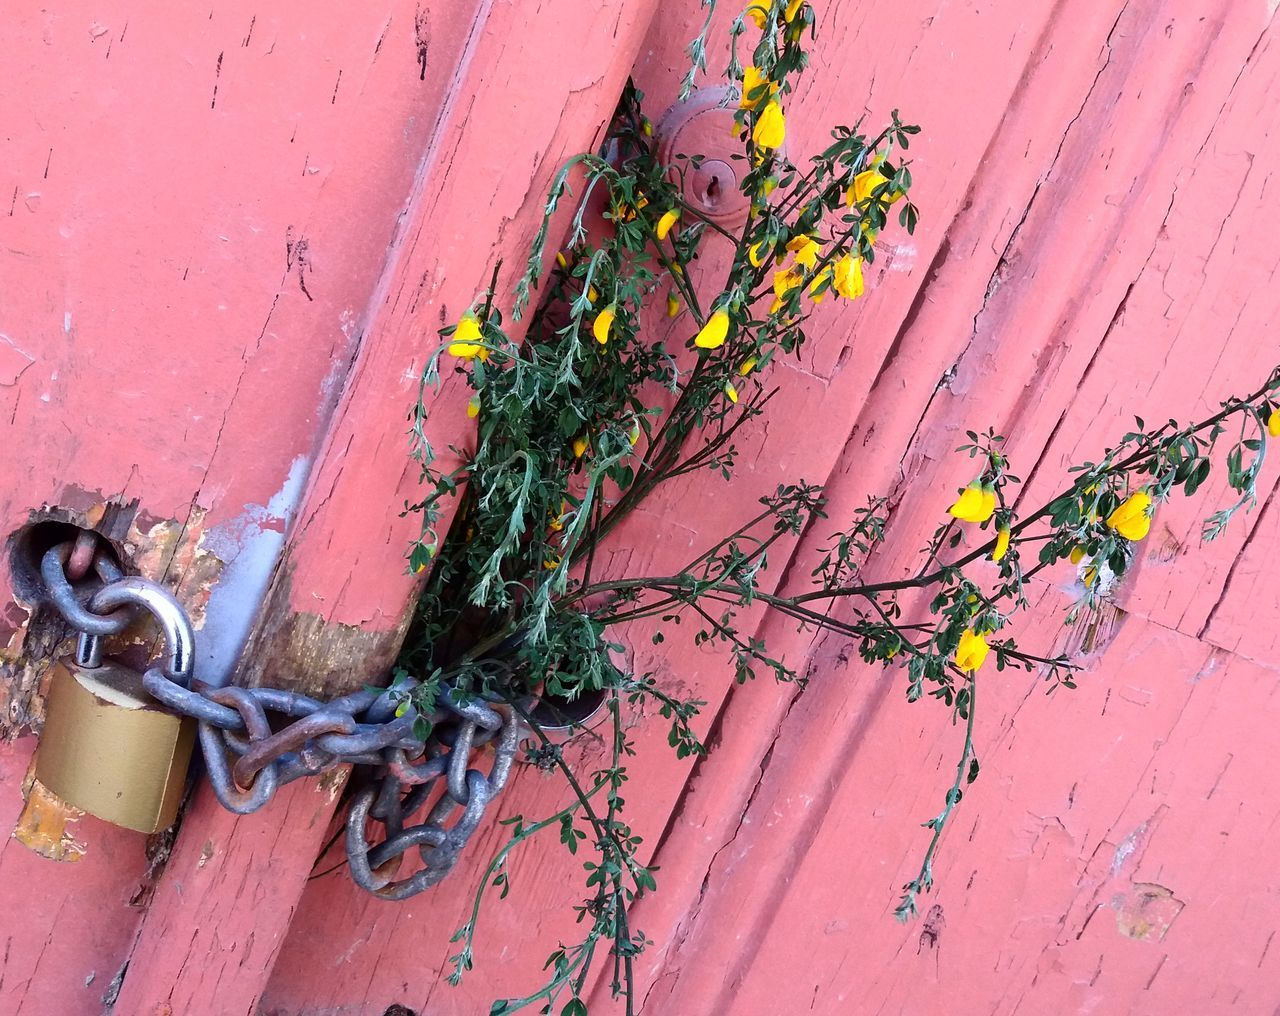 Eyeemporto Streetphotography Flowers Ghost Town Abandoned Places Maias Maio 1demaio Oportolovers Igers_porto Lovelyplanet Peloscaminhosdeportugal Ig_porto A_meu_ver Portugaldenorteasul Heritage Cultura Popular Culture